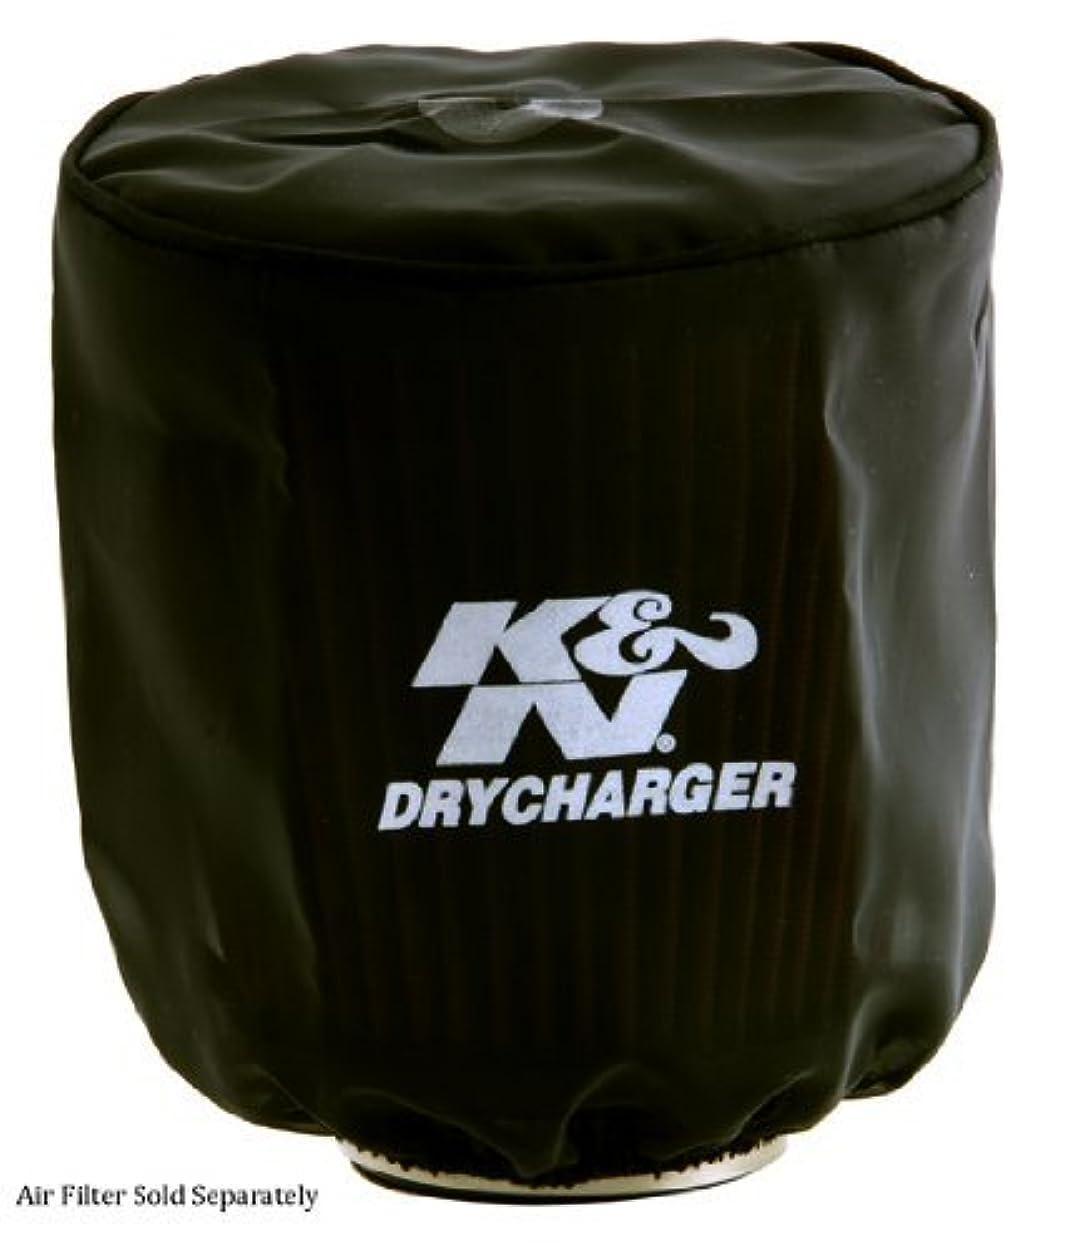 ビバ検索化学者K&N RX-3810DK Black Drycharger Air Filter Wrap [並行輸入品]